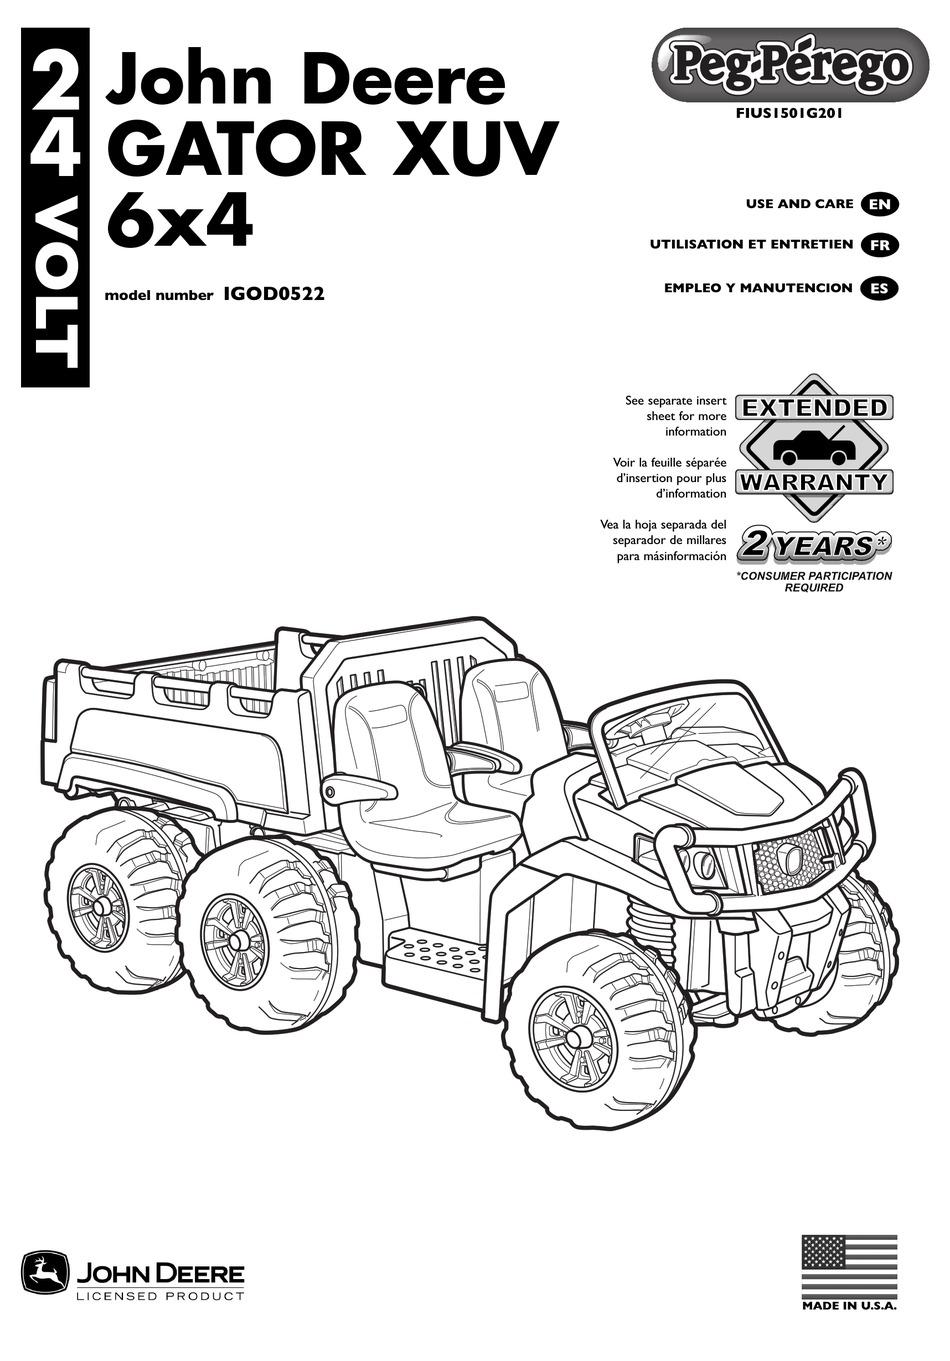 PEG-PEREGO JOHN DEERE GATOR XUV 6X4 USE AND CARE MANUAL